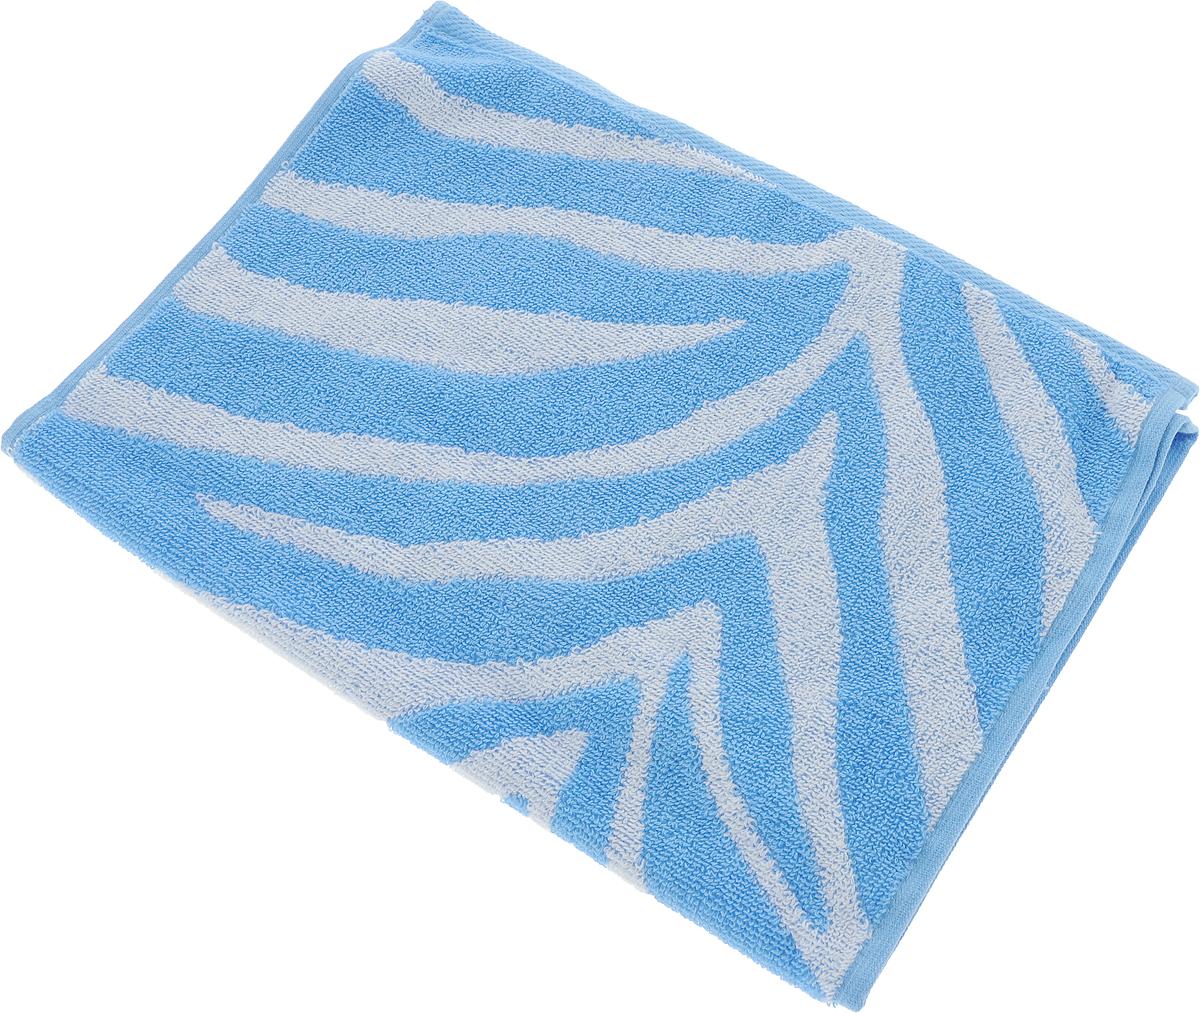 Полотенце Aquarelle Мадагаскар. Зебра, цвет: белый, синий, 35 х 70 см полотенце aquarelle стамбул 70x140cm white blue 710397